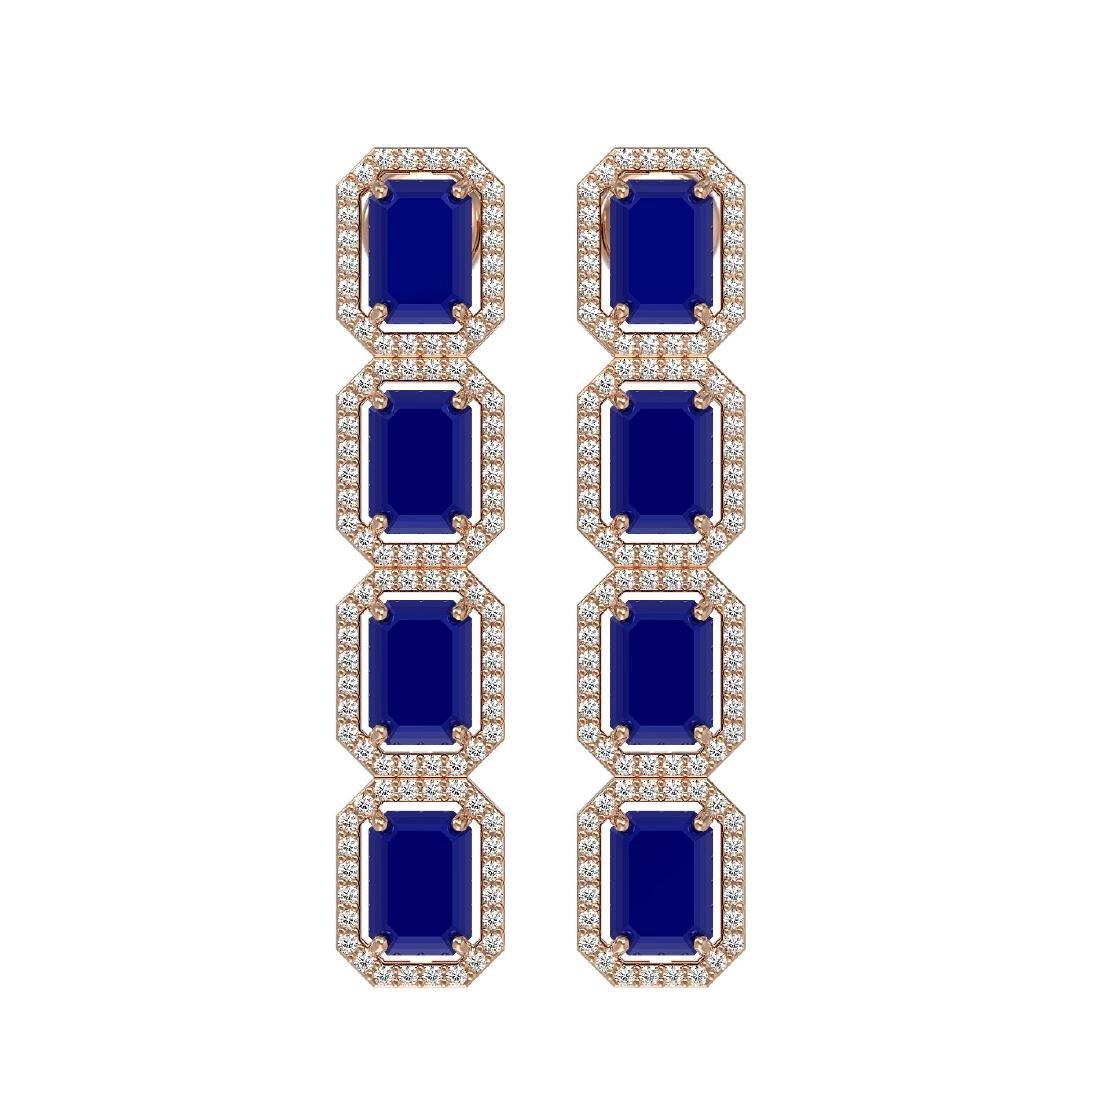 12.33 CTW Sapphire & Diamond Halo Earrings 10K Rose